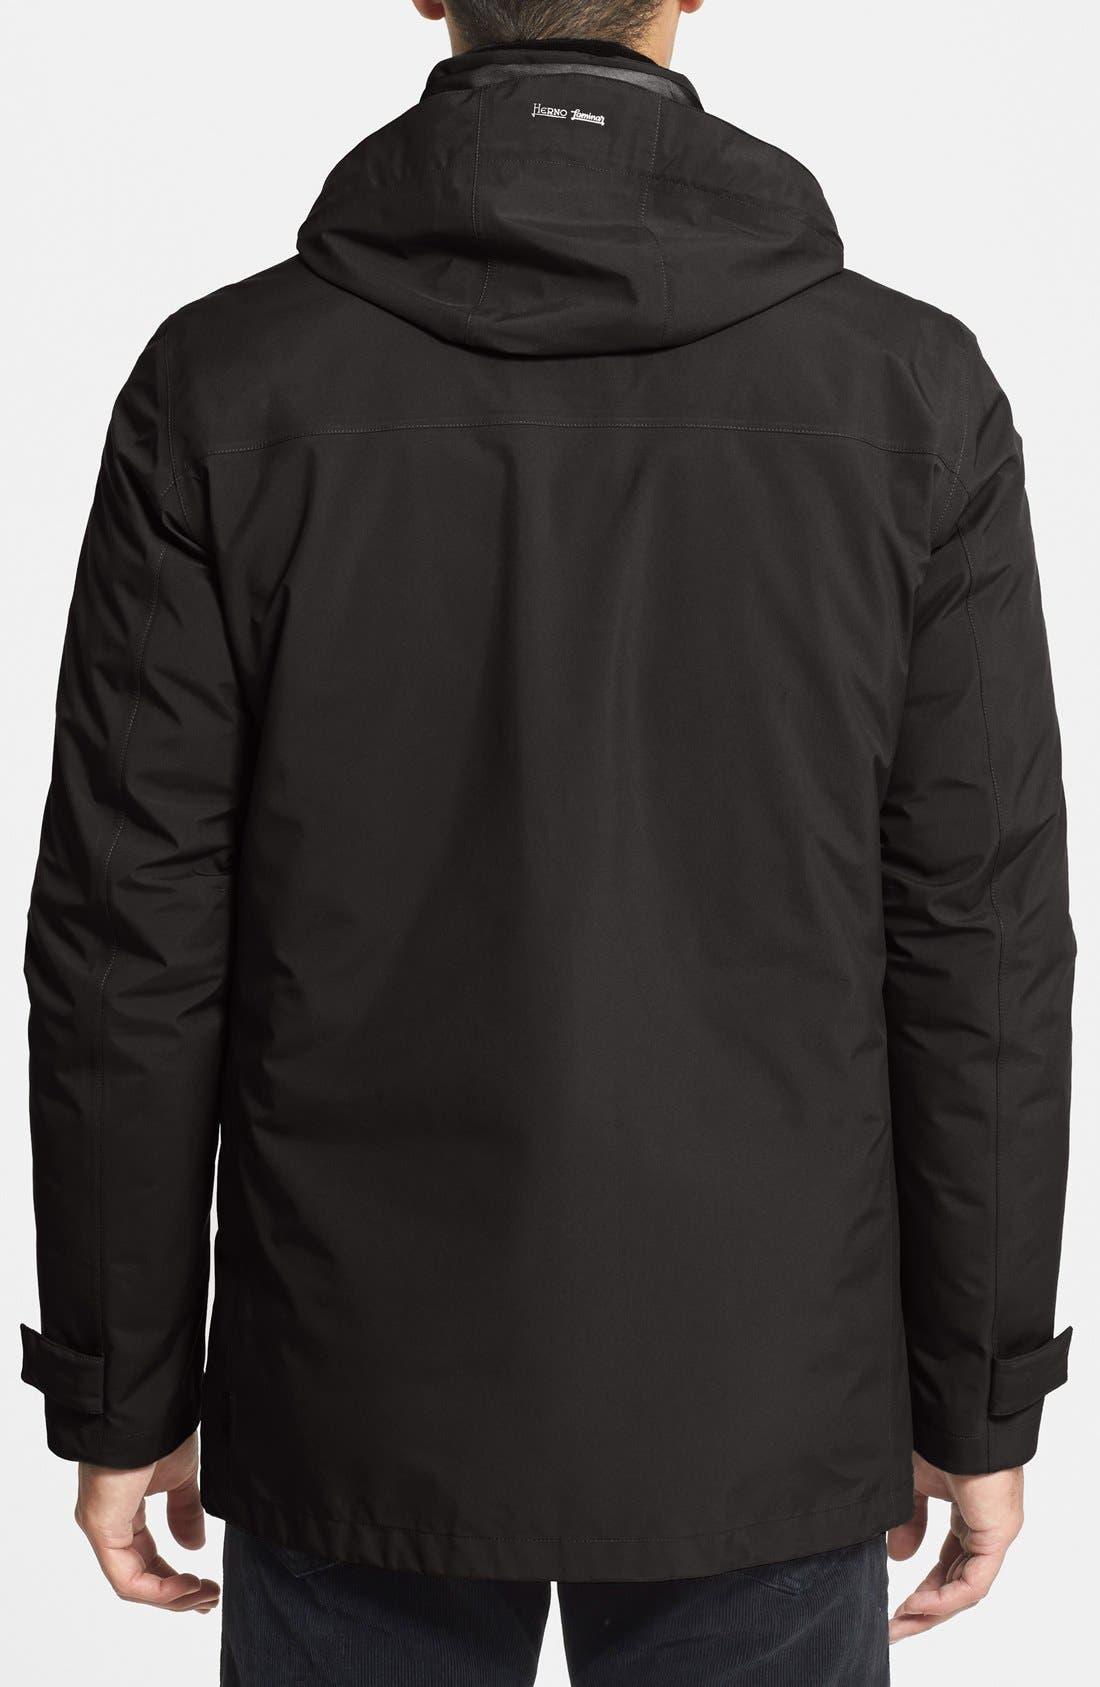 HERNO,                             'Laminar' Waterproof Gore-Tex<sup>®</sup> 3-in-1 Jacket,                             Alternate thumbnail 2, color,                             001